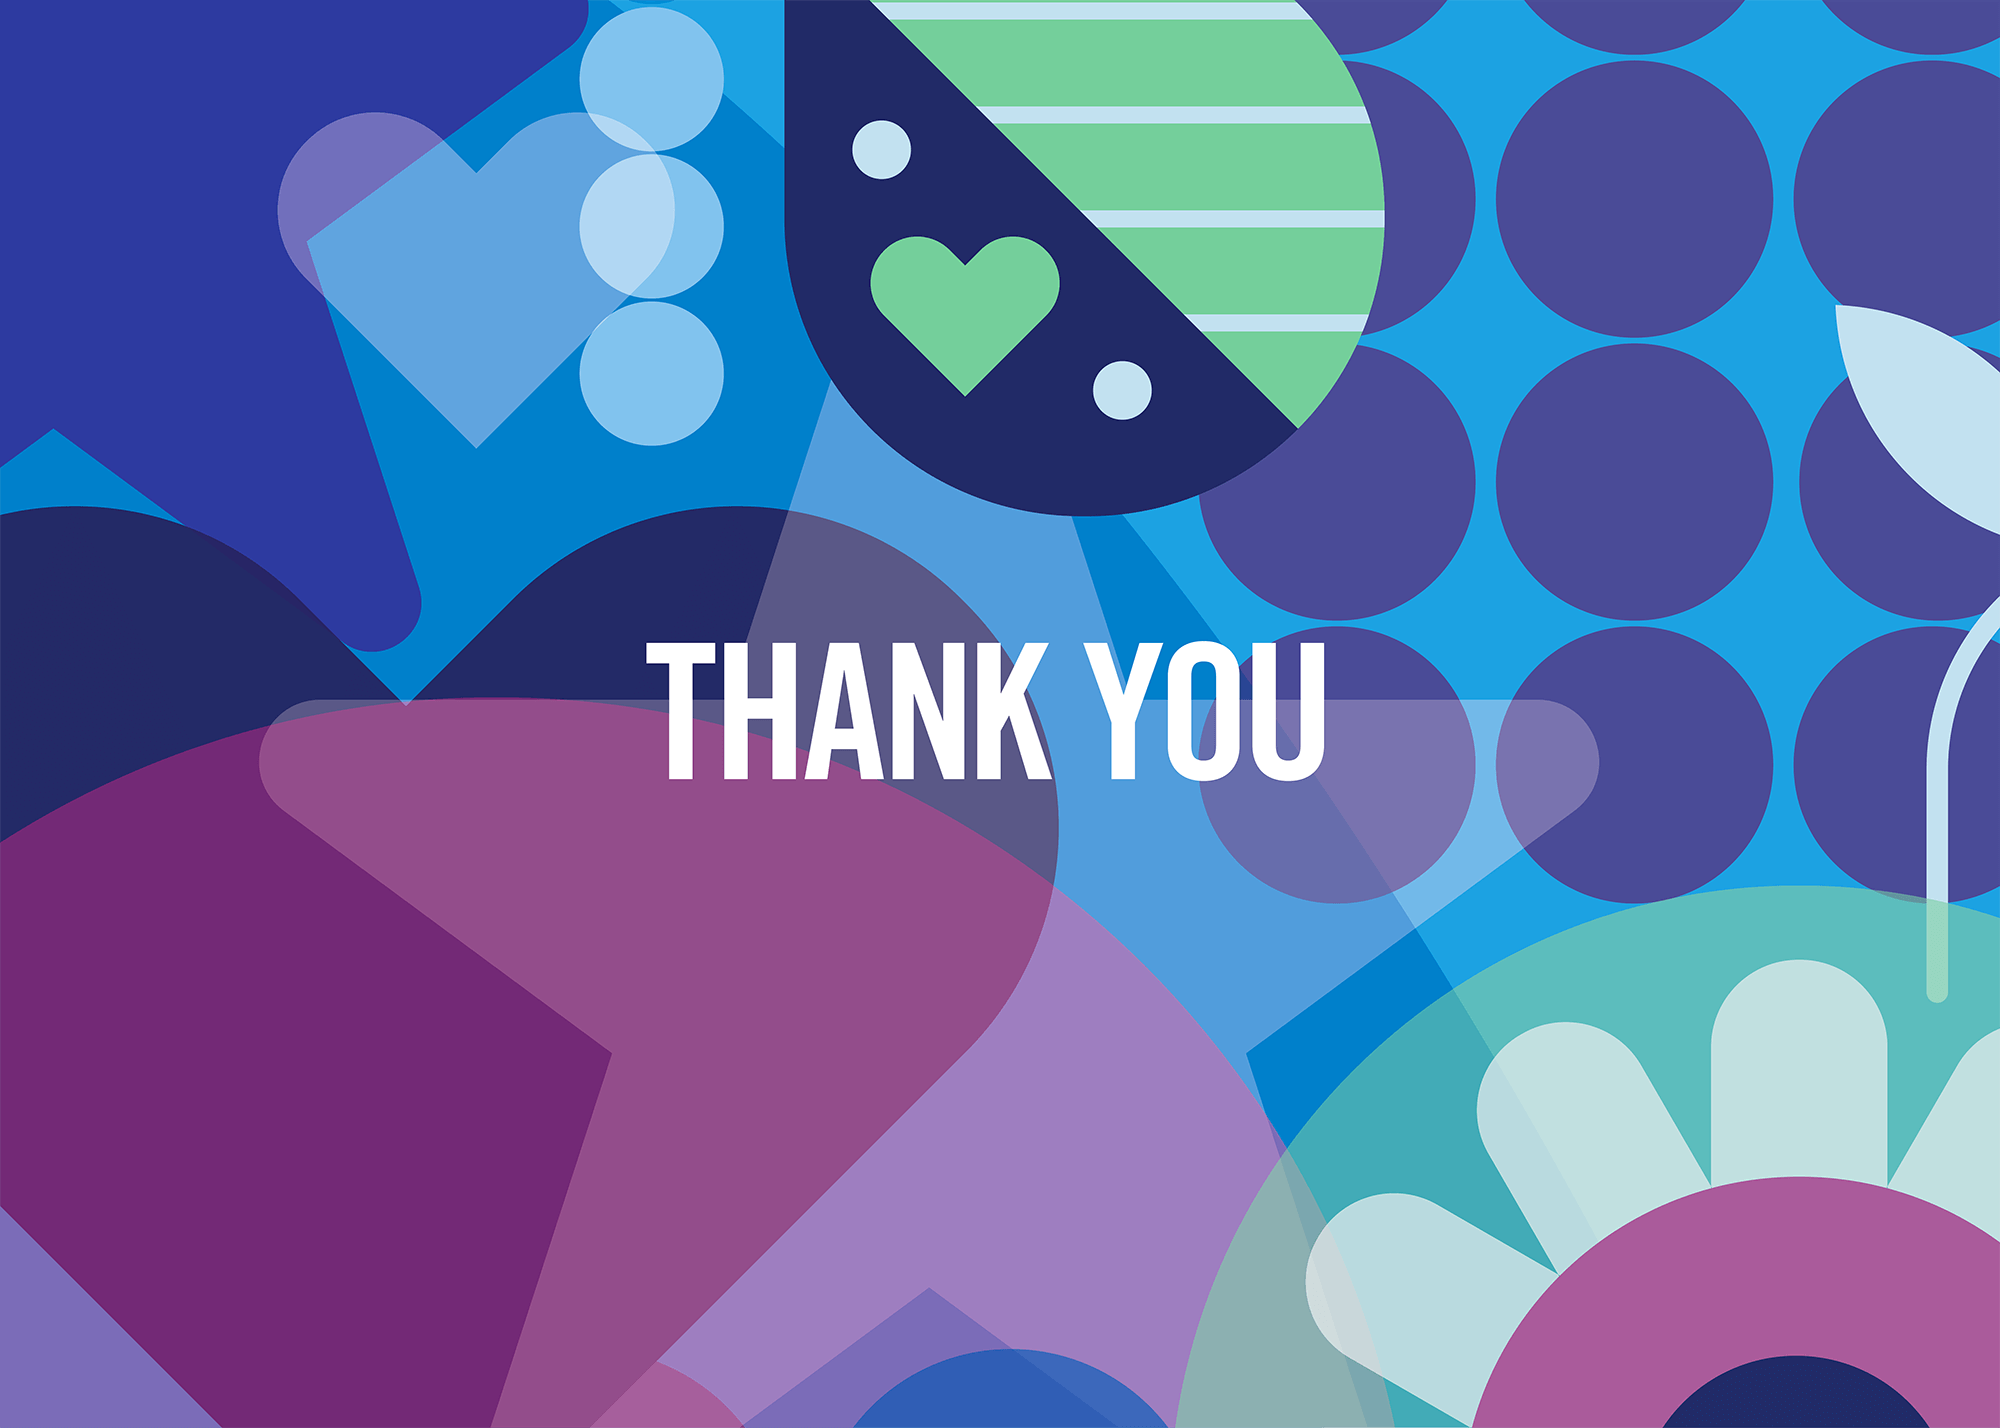 thankyou-card3.png